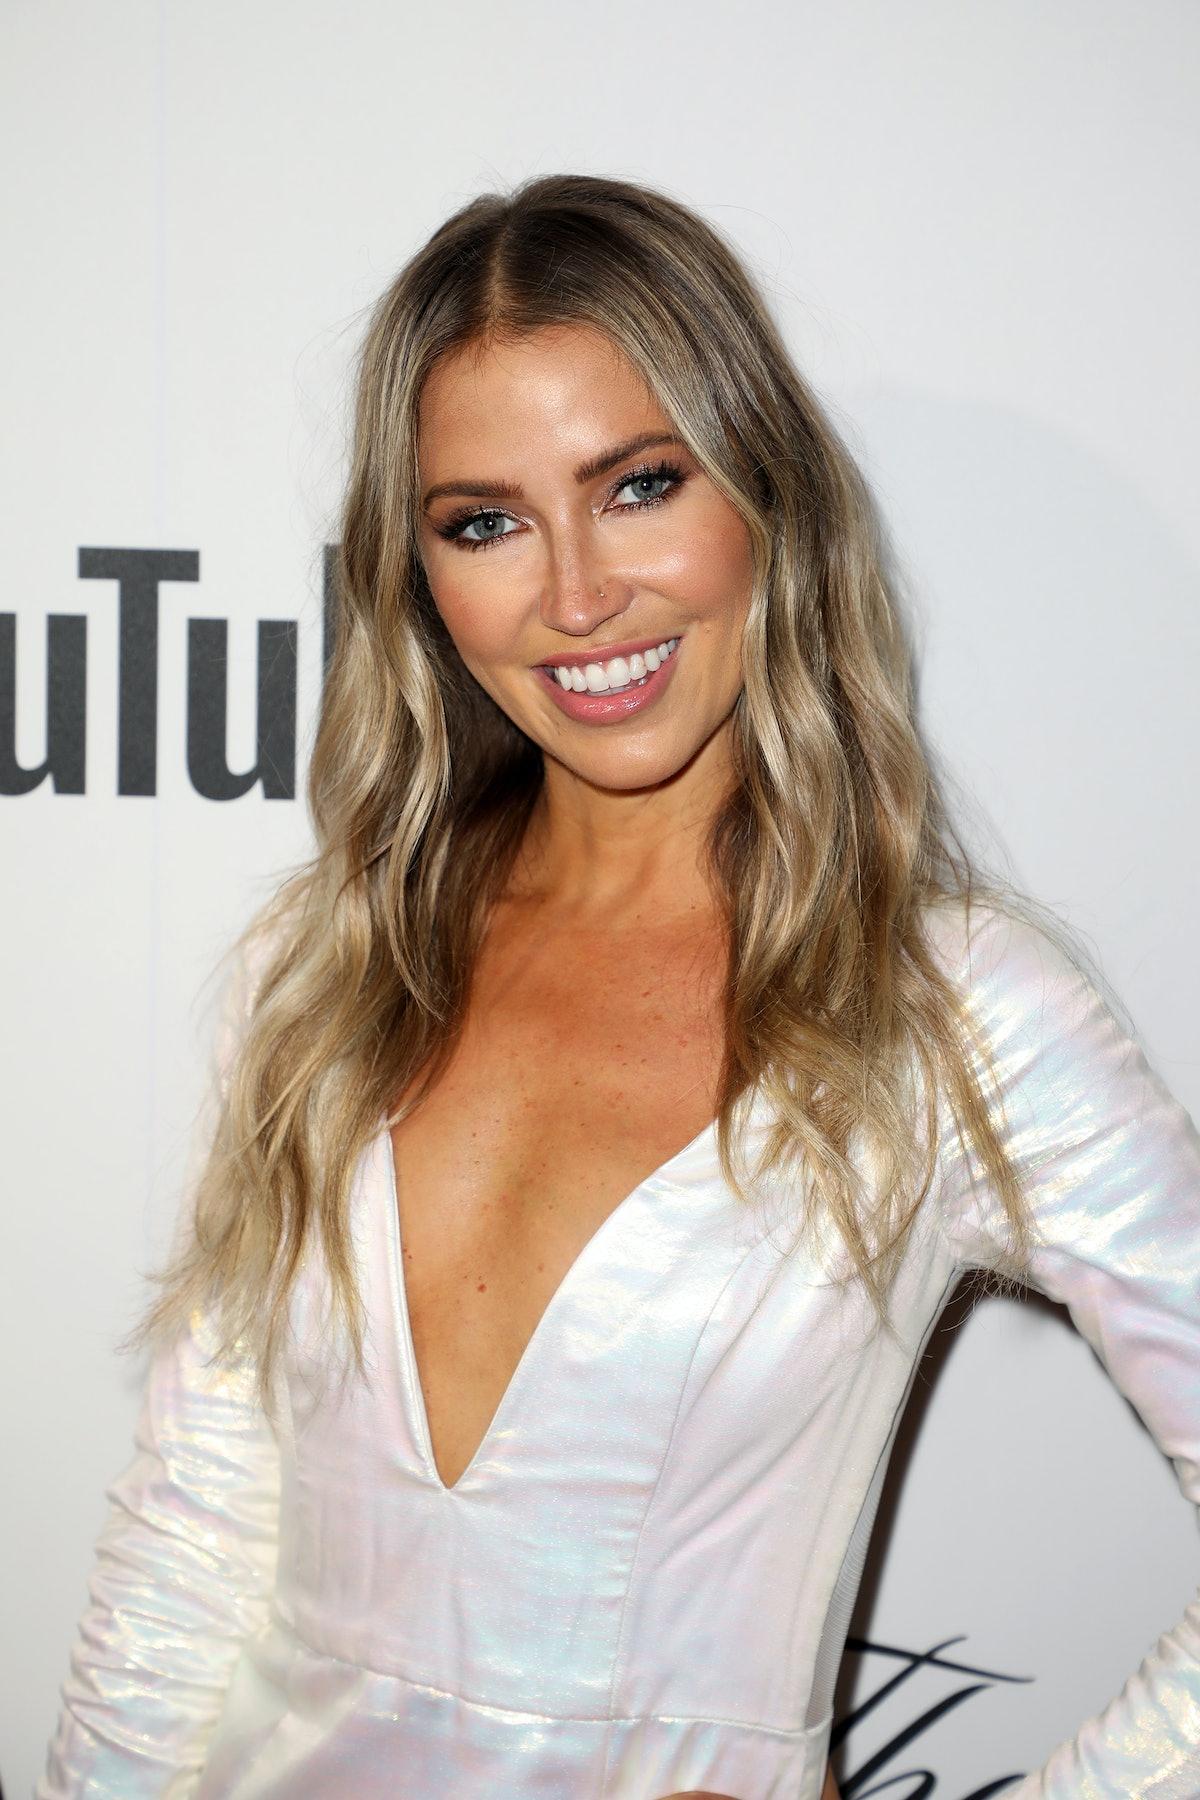 Tayshia Adams and Kaitlyn Bristowe will host 'The Bachelorette' Season 17 following Chris Harrison's...